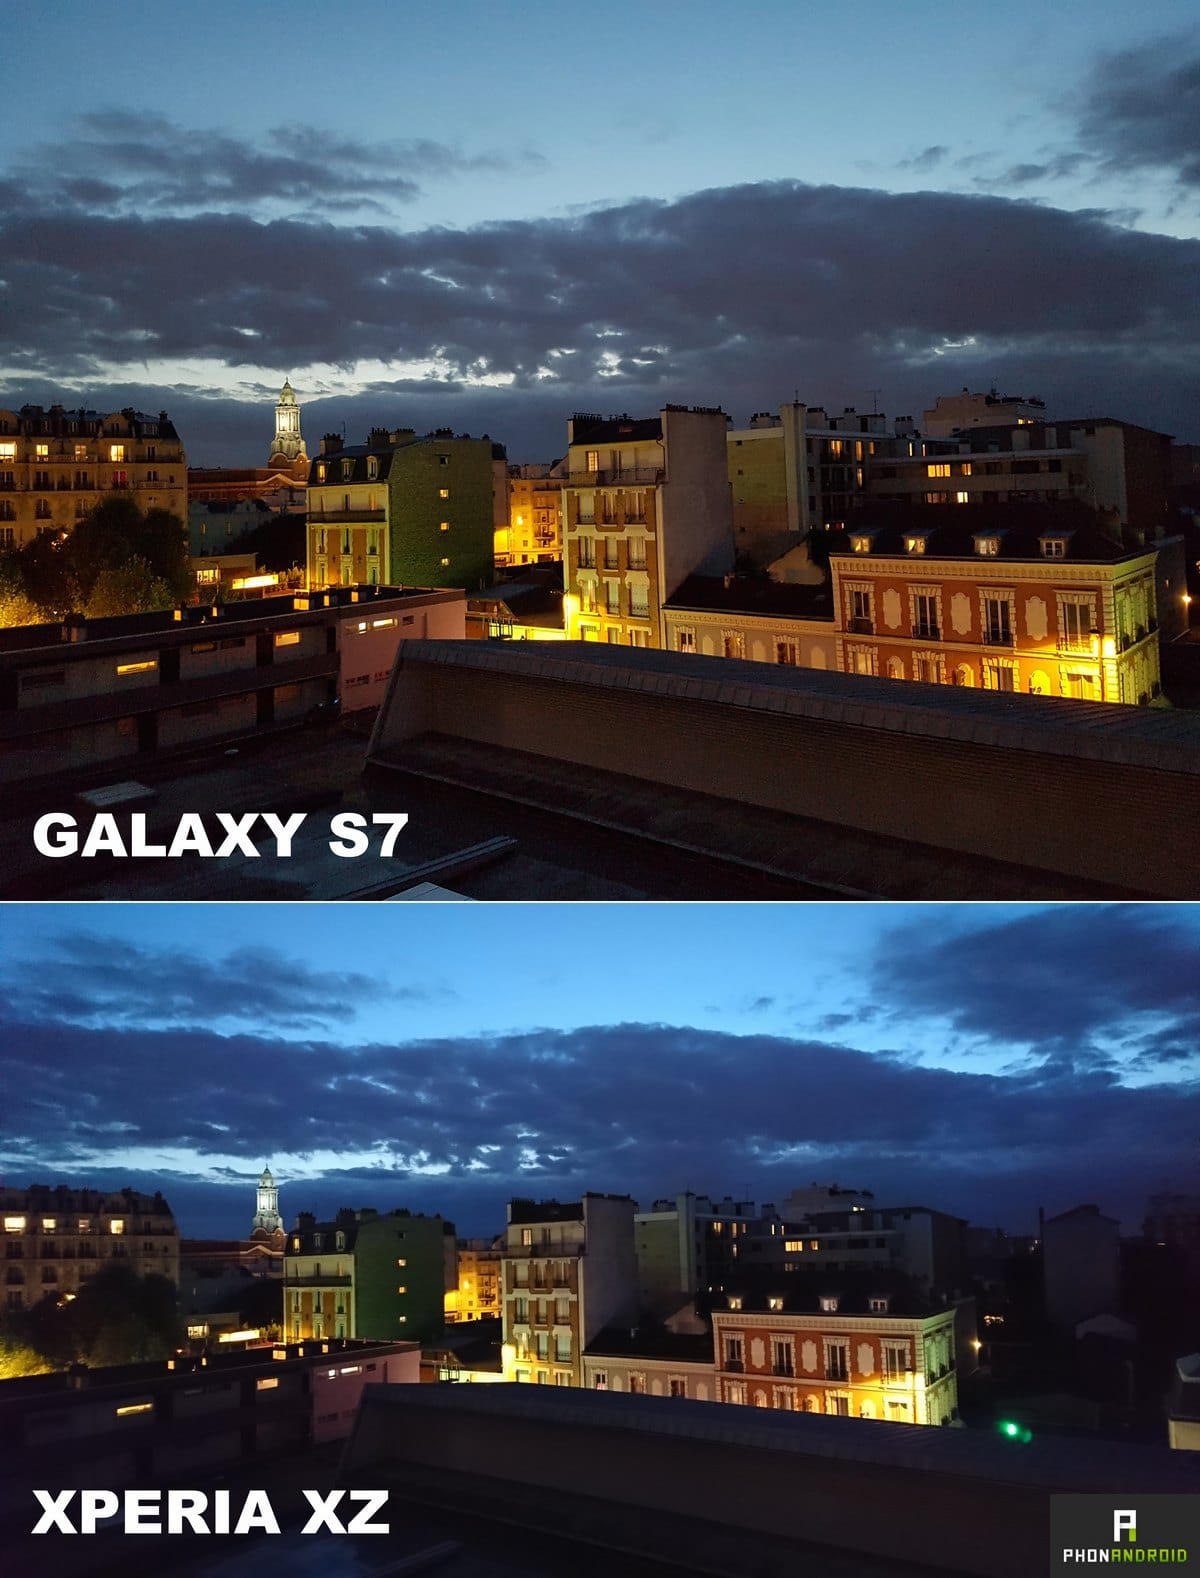 sony-xperia-xz-galaxy-s7-photo